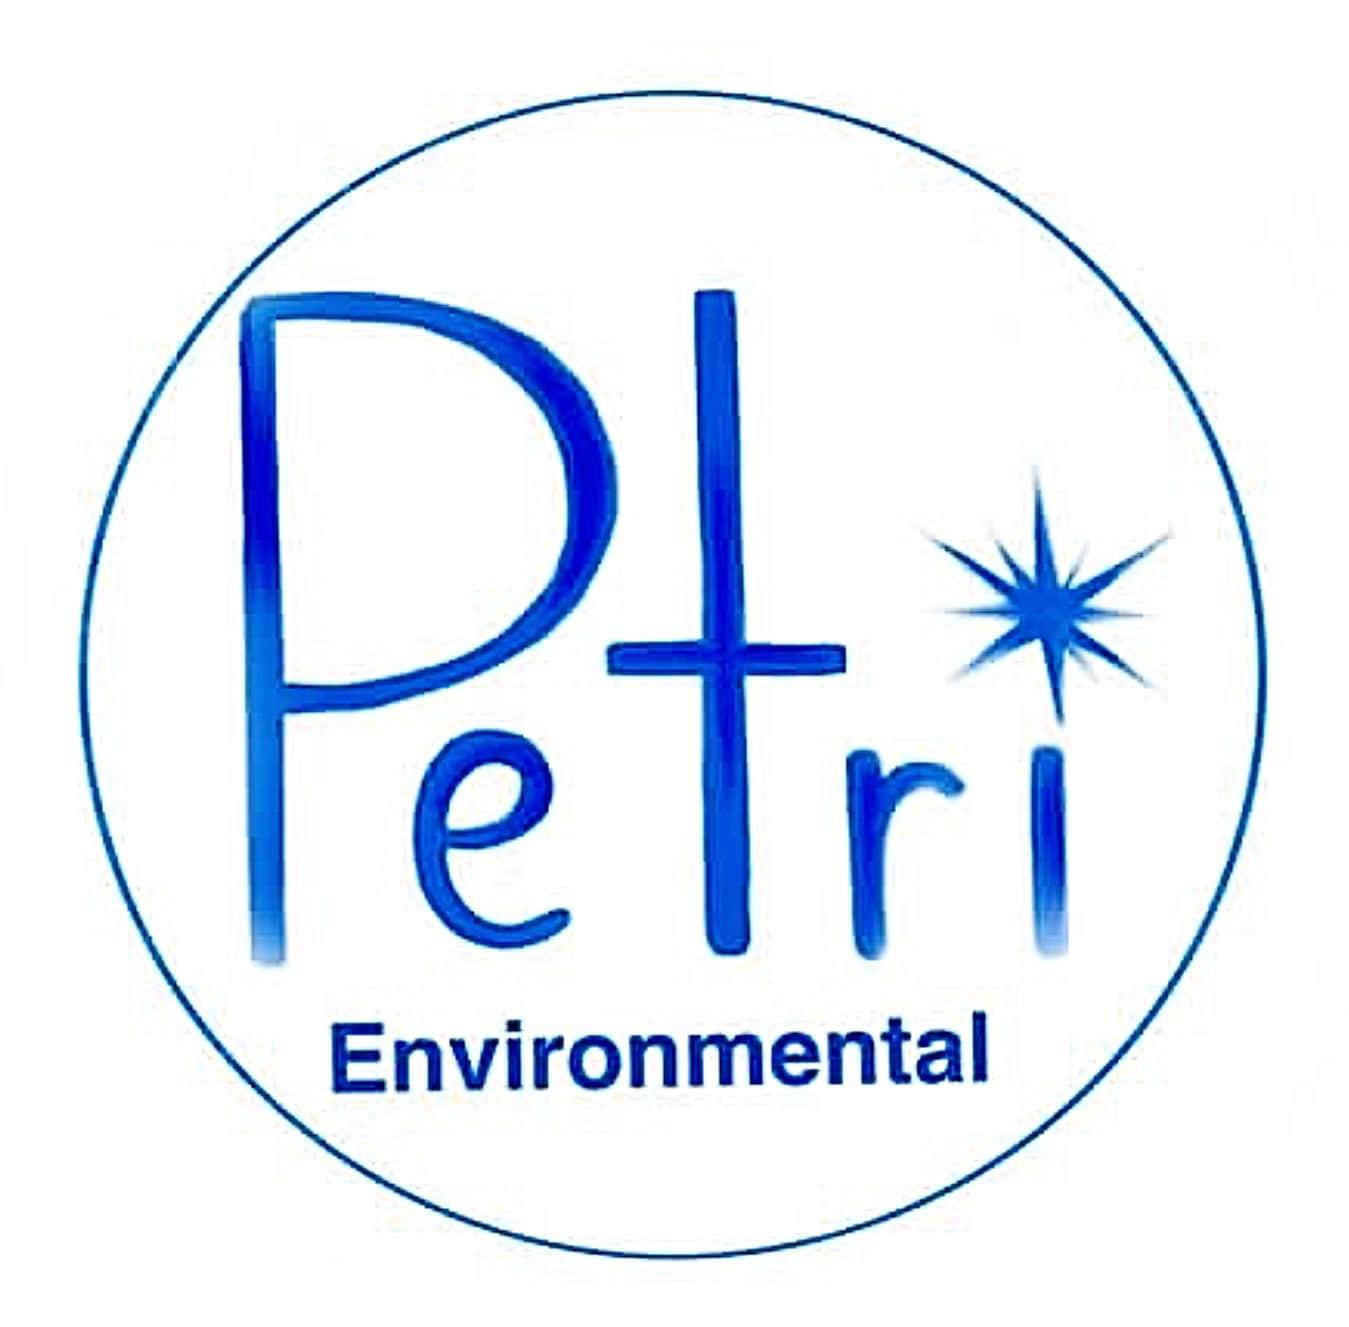 Petri Environmental Llc